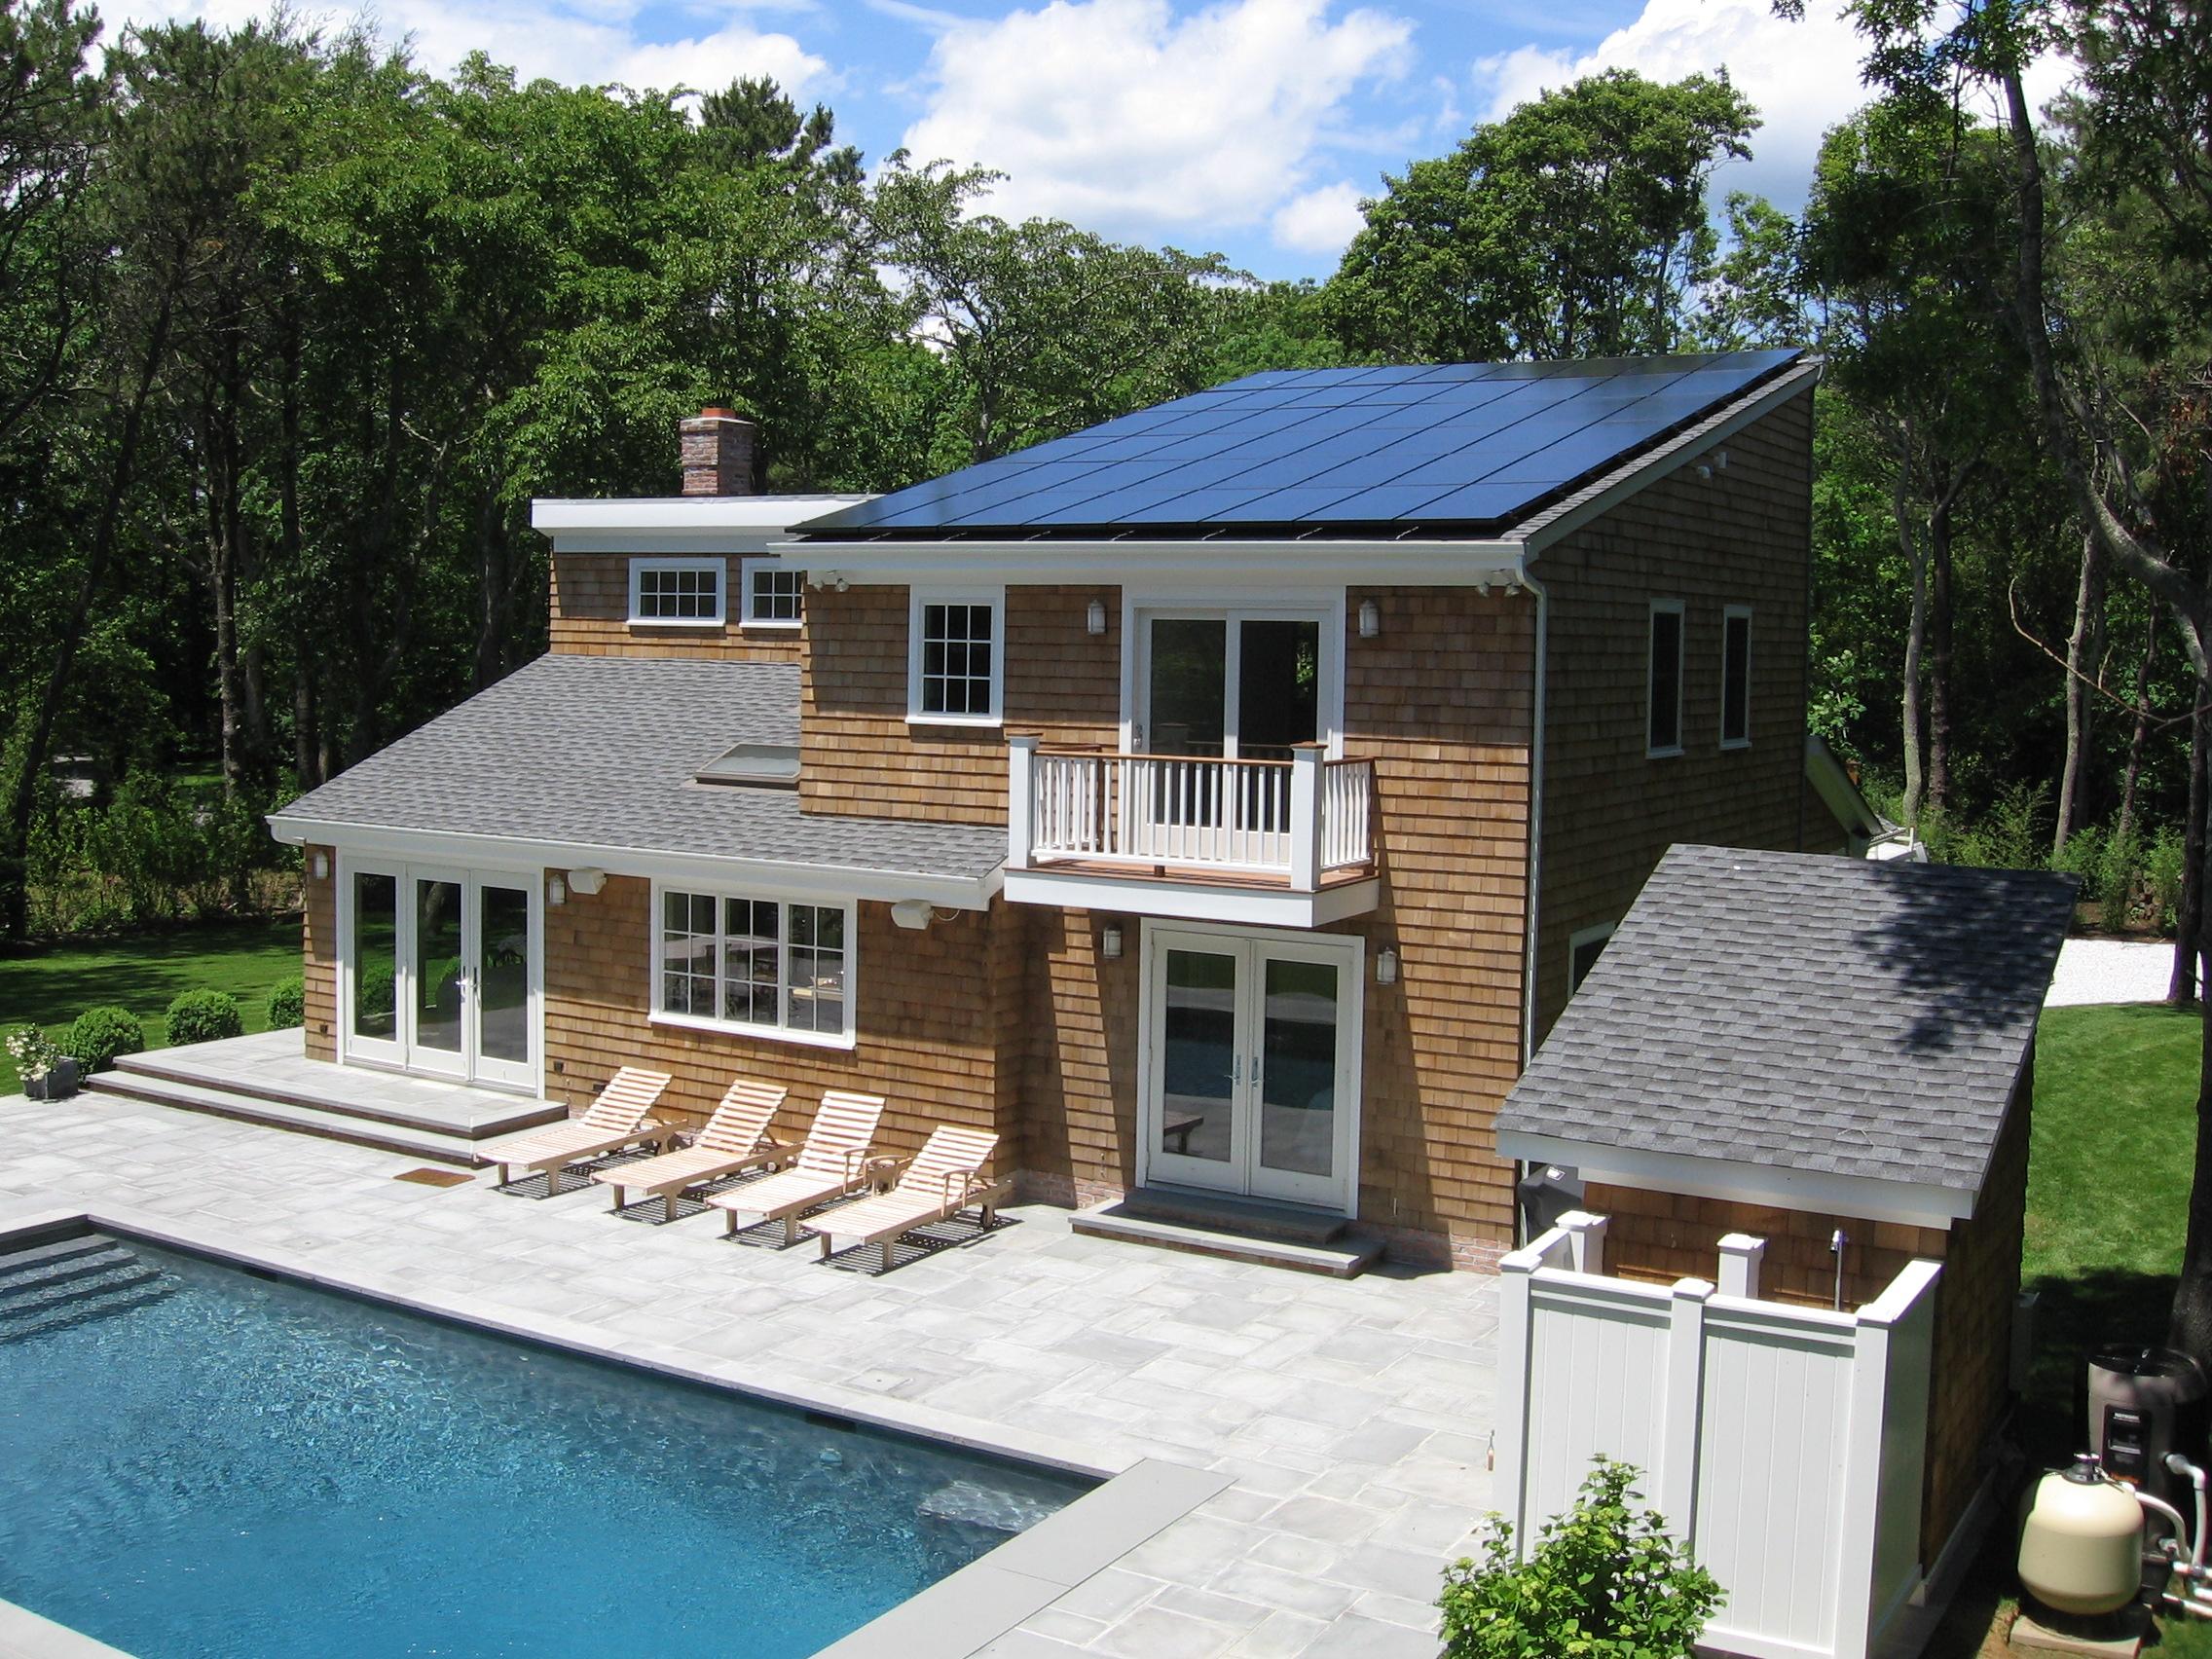 Gallery - Net 0 Energy Homes